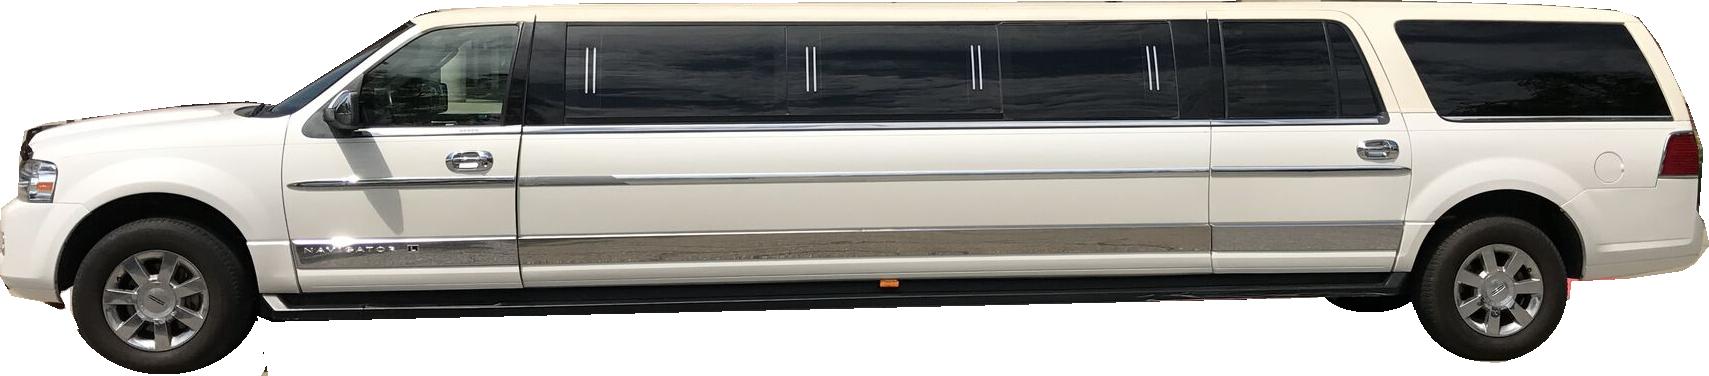 Fleet - Leisure Limousine & Sedan